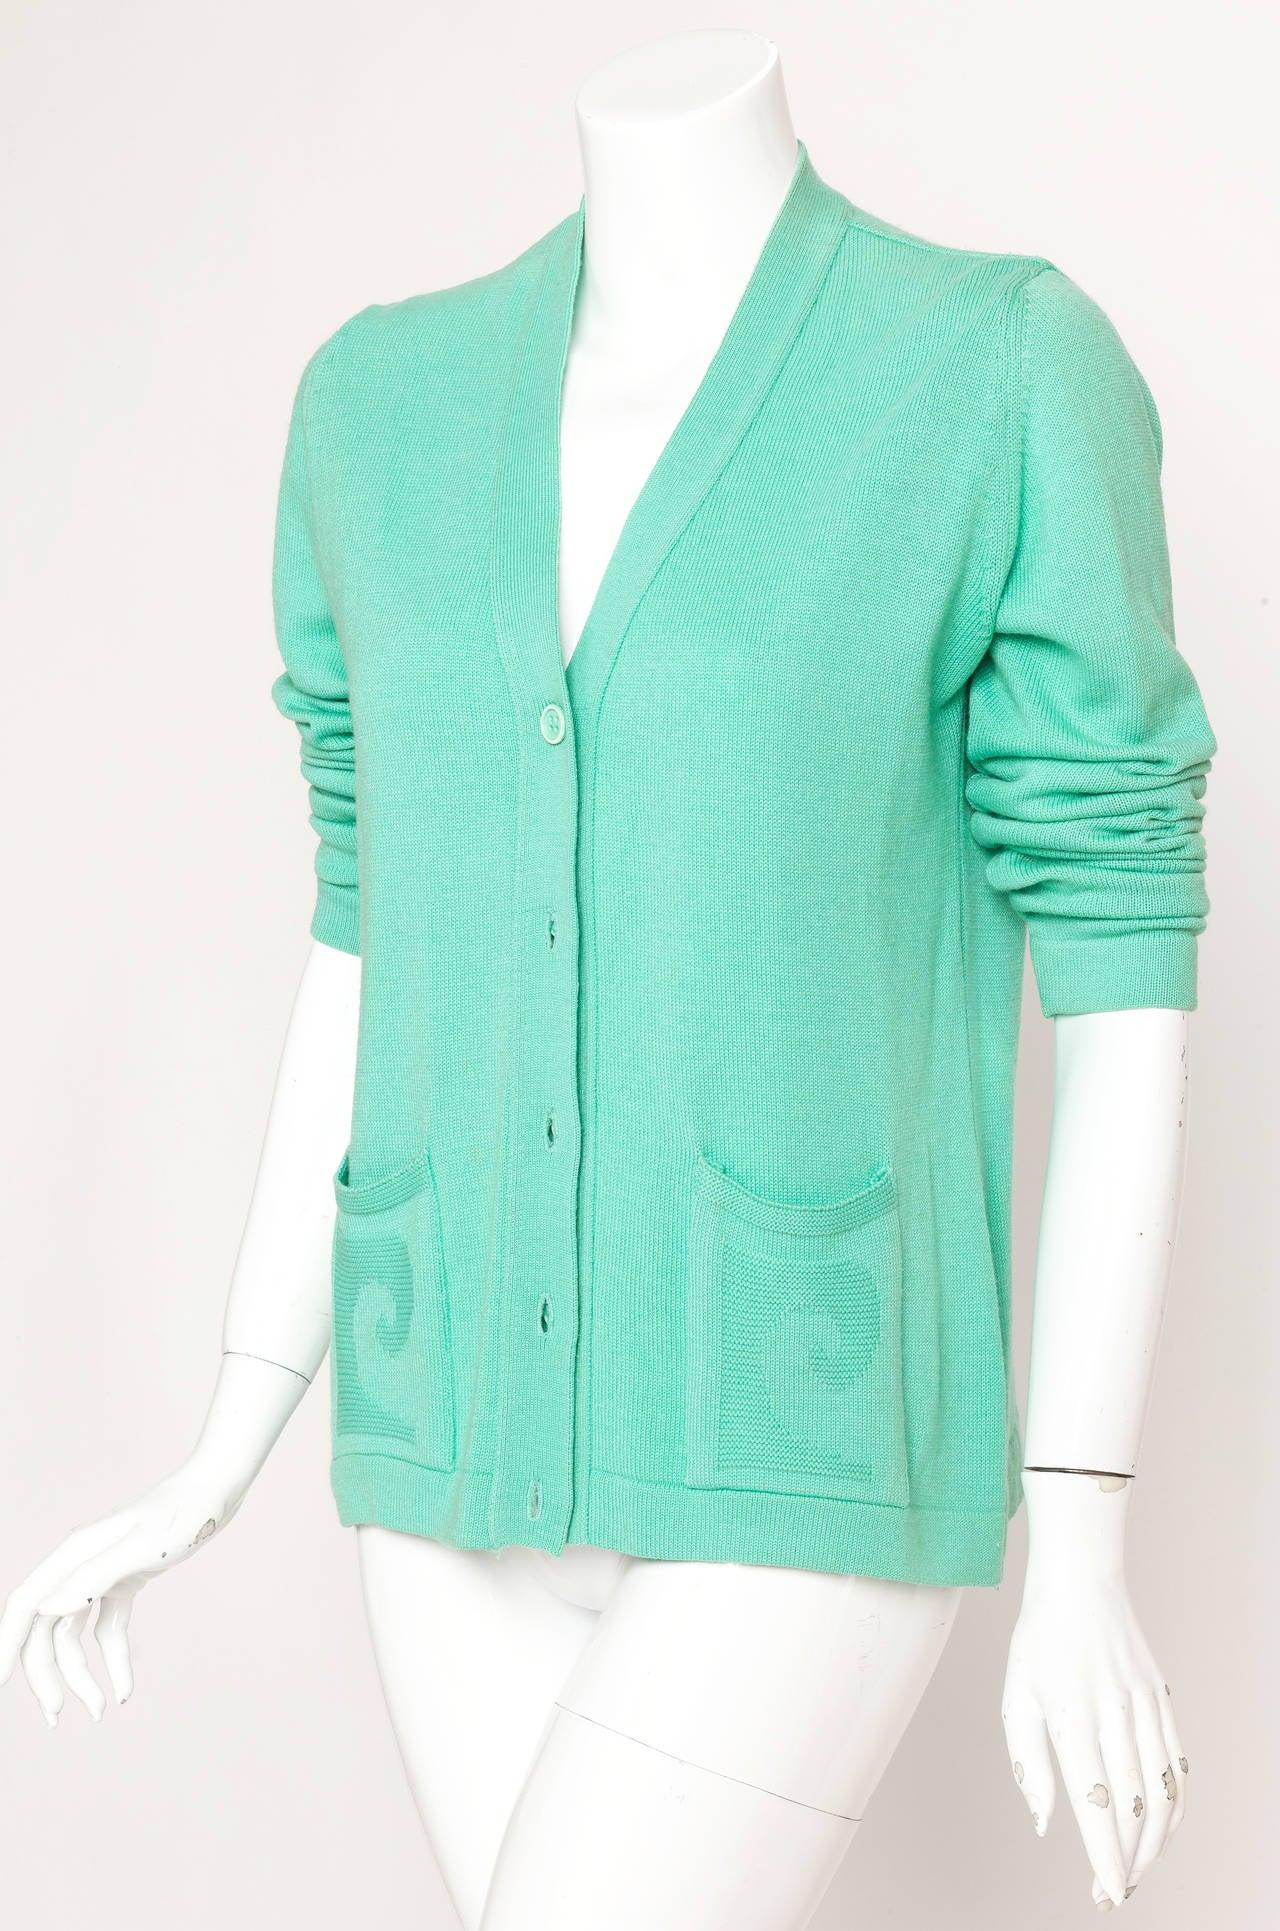 Vintage Pierre Cardin Aqua Green Cardigan w/Logo at Pockets 3